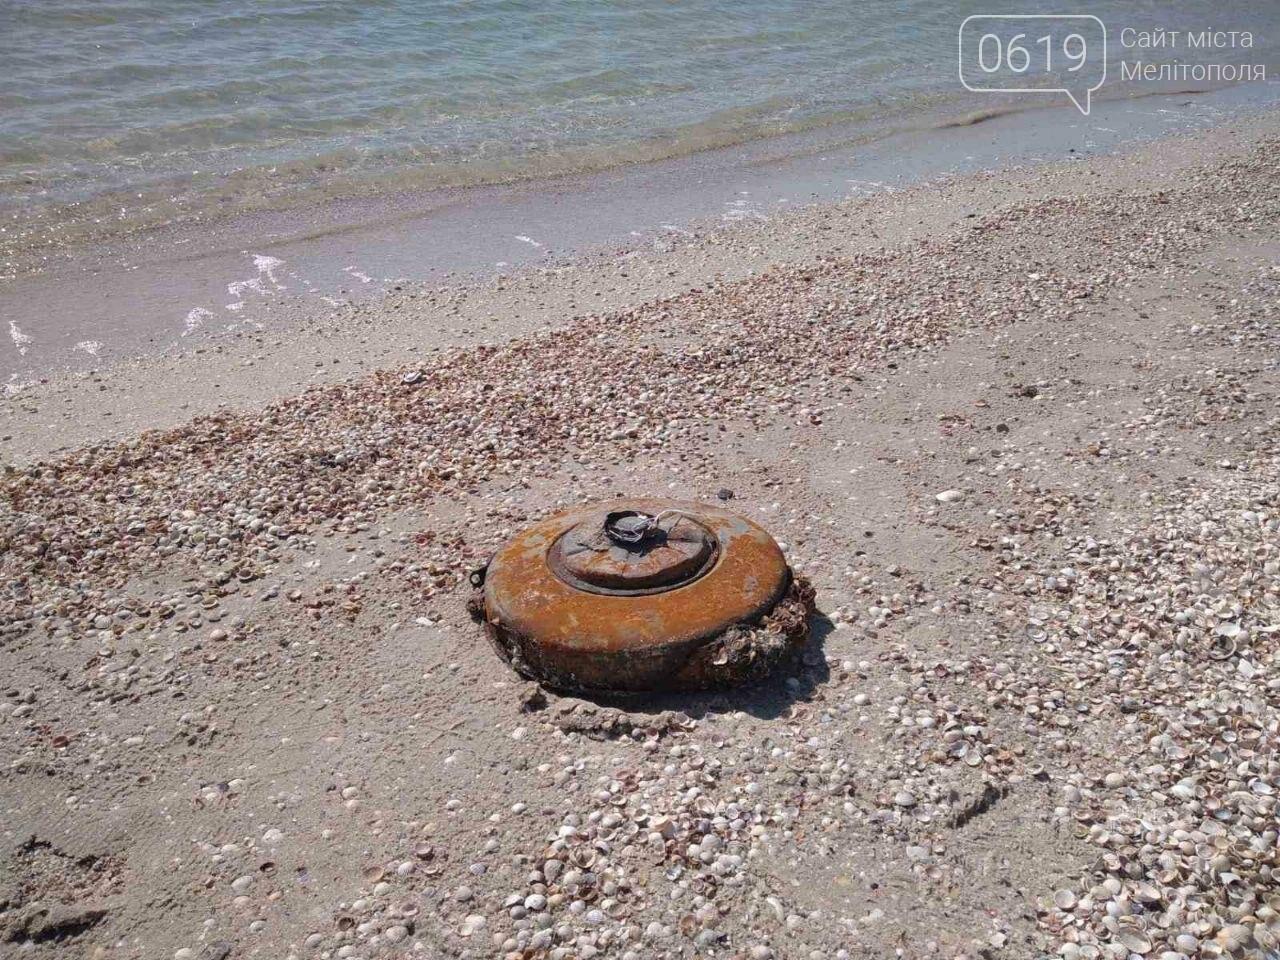 Спасатели обезвредили противотанковую мину, обнаруженную на берегу моря в Кирилловке, фото-1